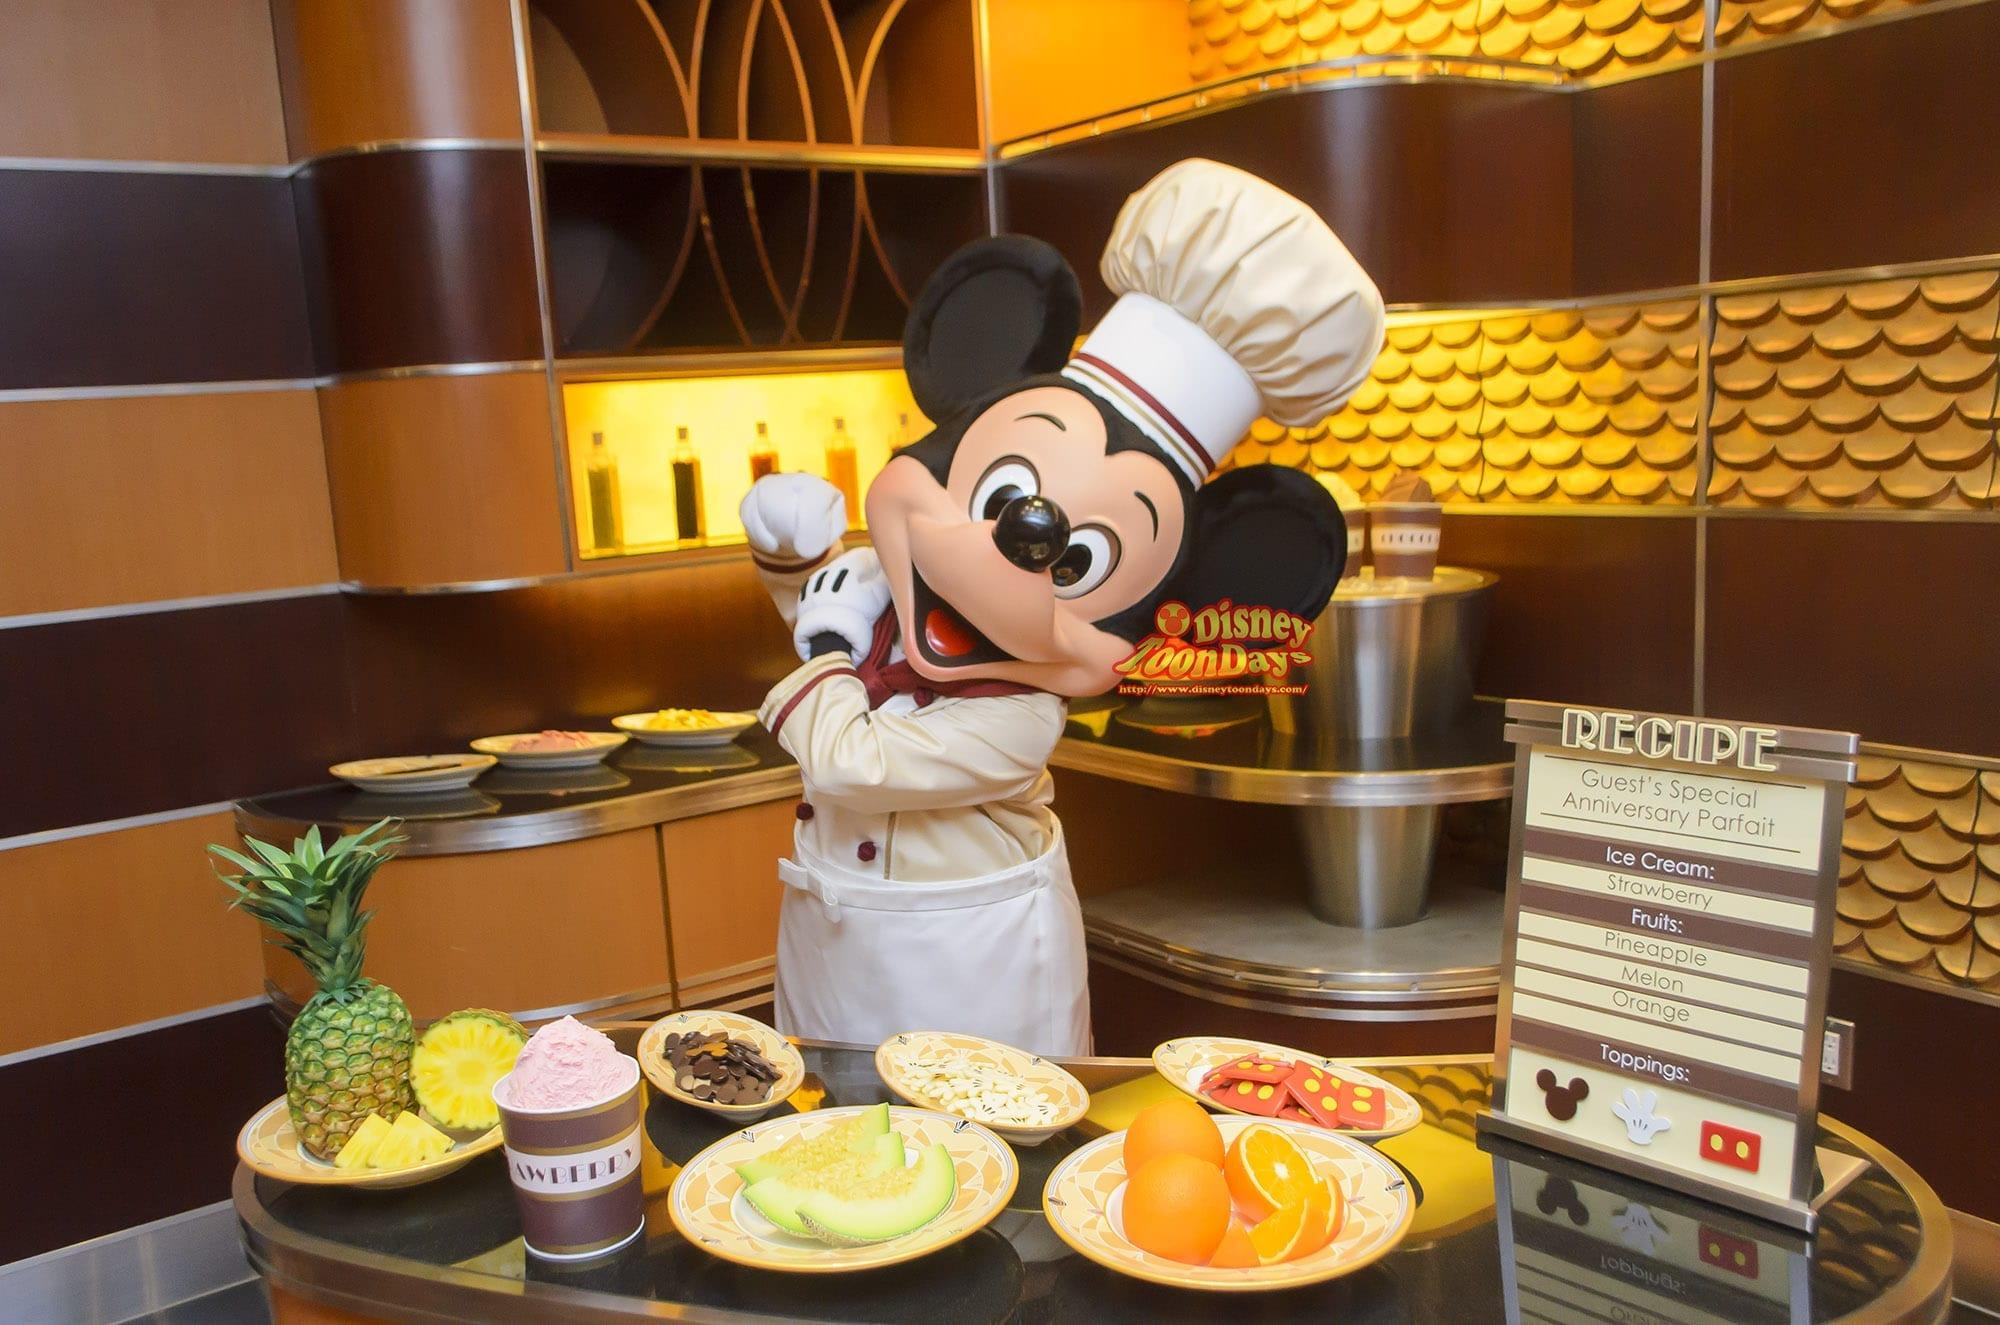 TDR ディズニーアンバサダーホテル エンパイアグリル マイアニバーサリーストーリー グリーティング ミッキーマウス